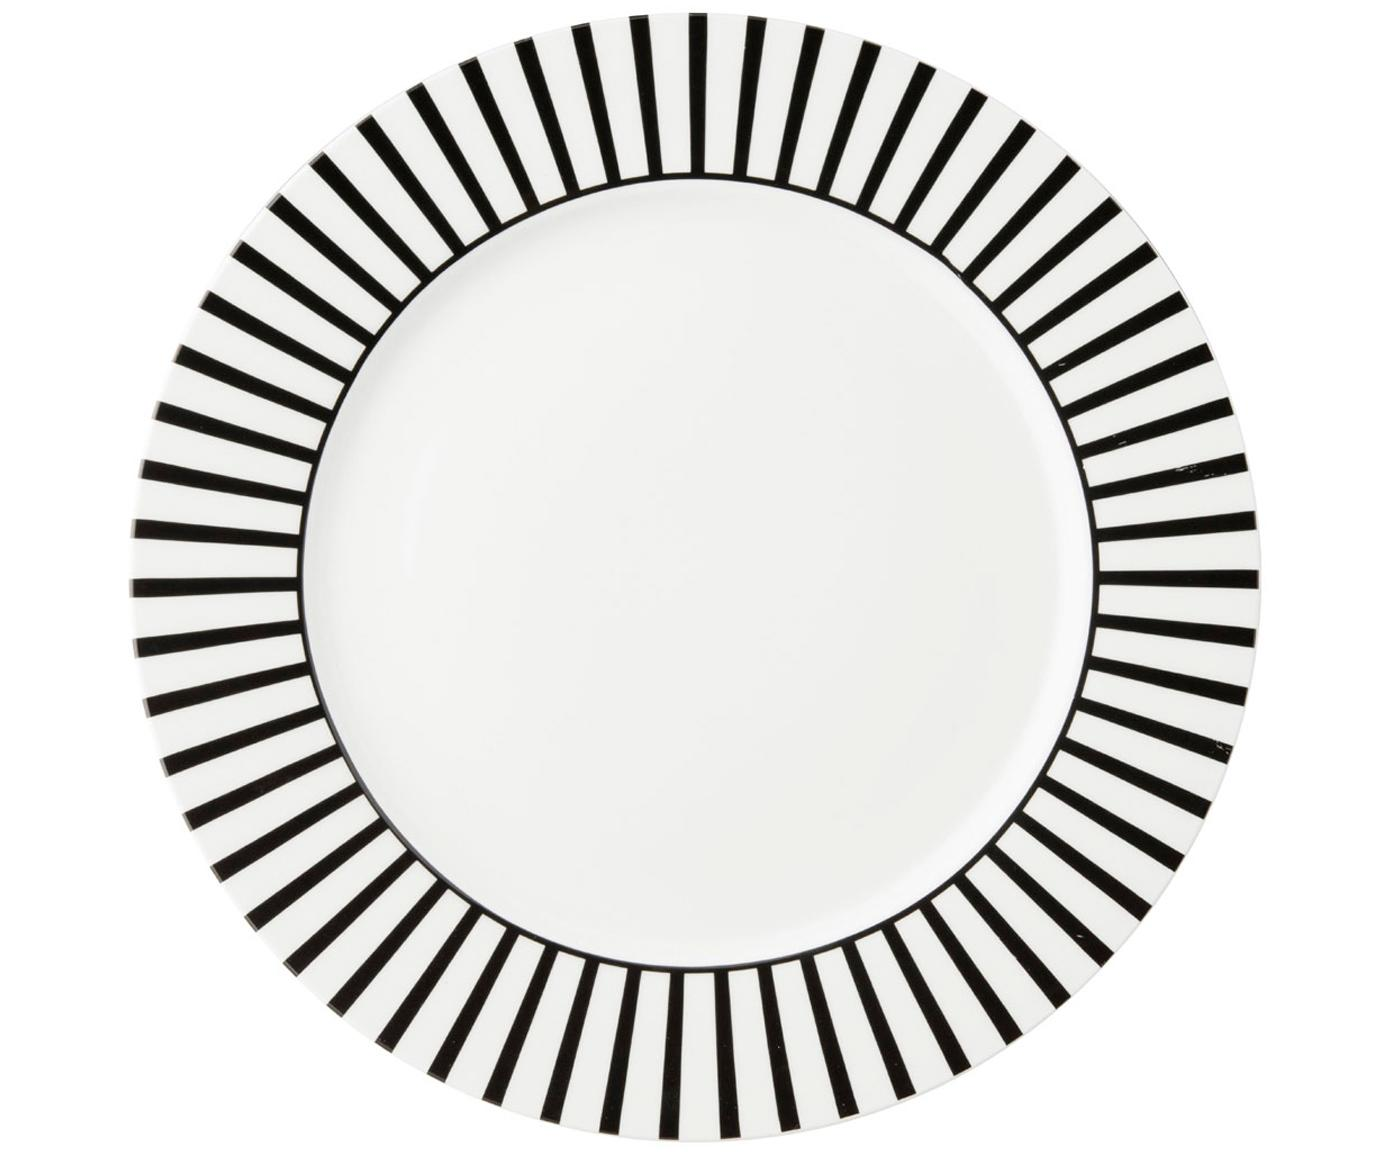 Piatto piano Ceres Loft 4 pz, Porcellana, Bianco, nero, Ø 26 x Alt. 2 cm